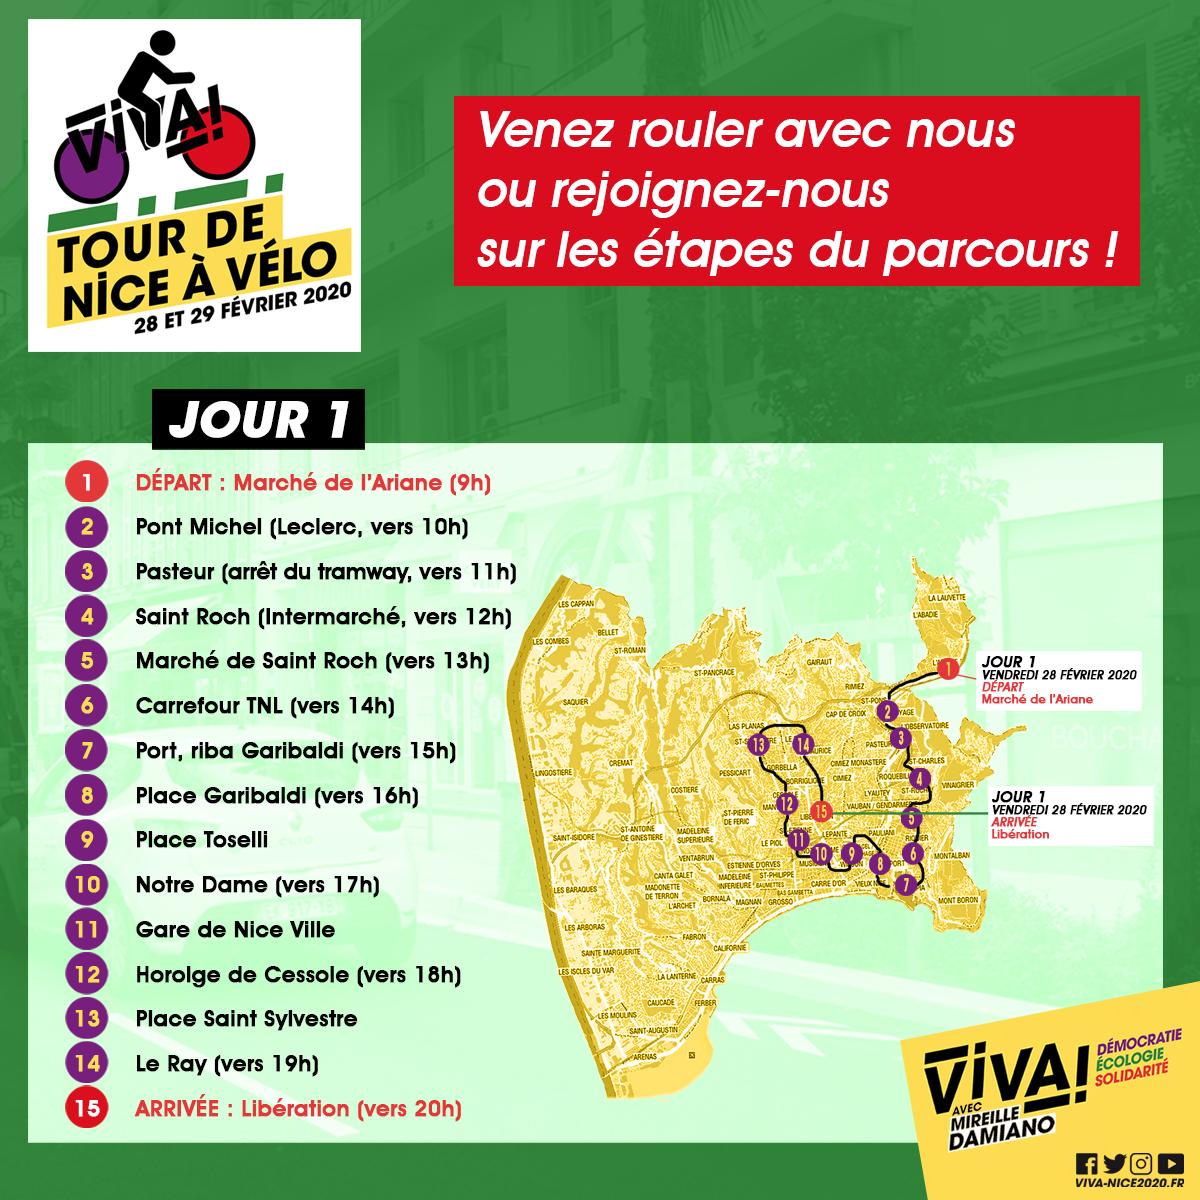 ViVA! Tour de Nice Jour 1